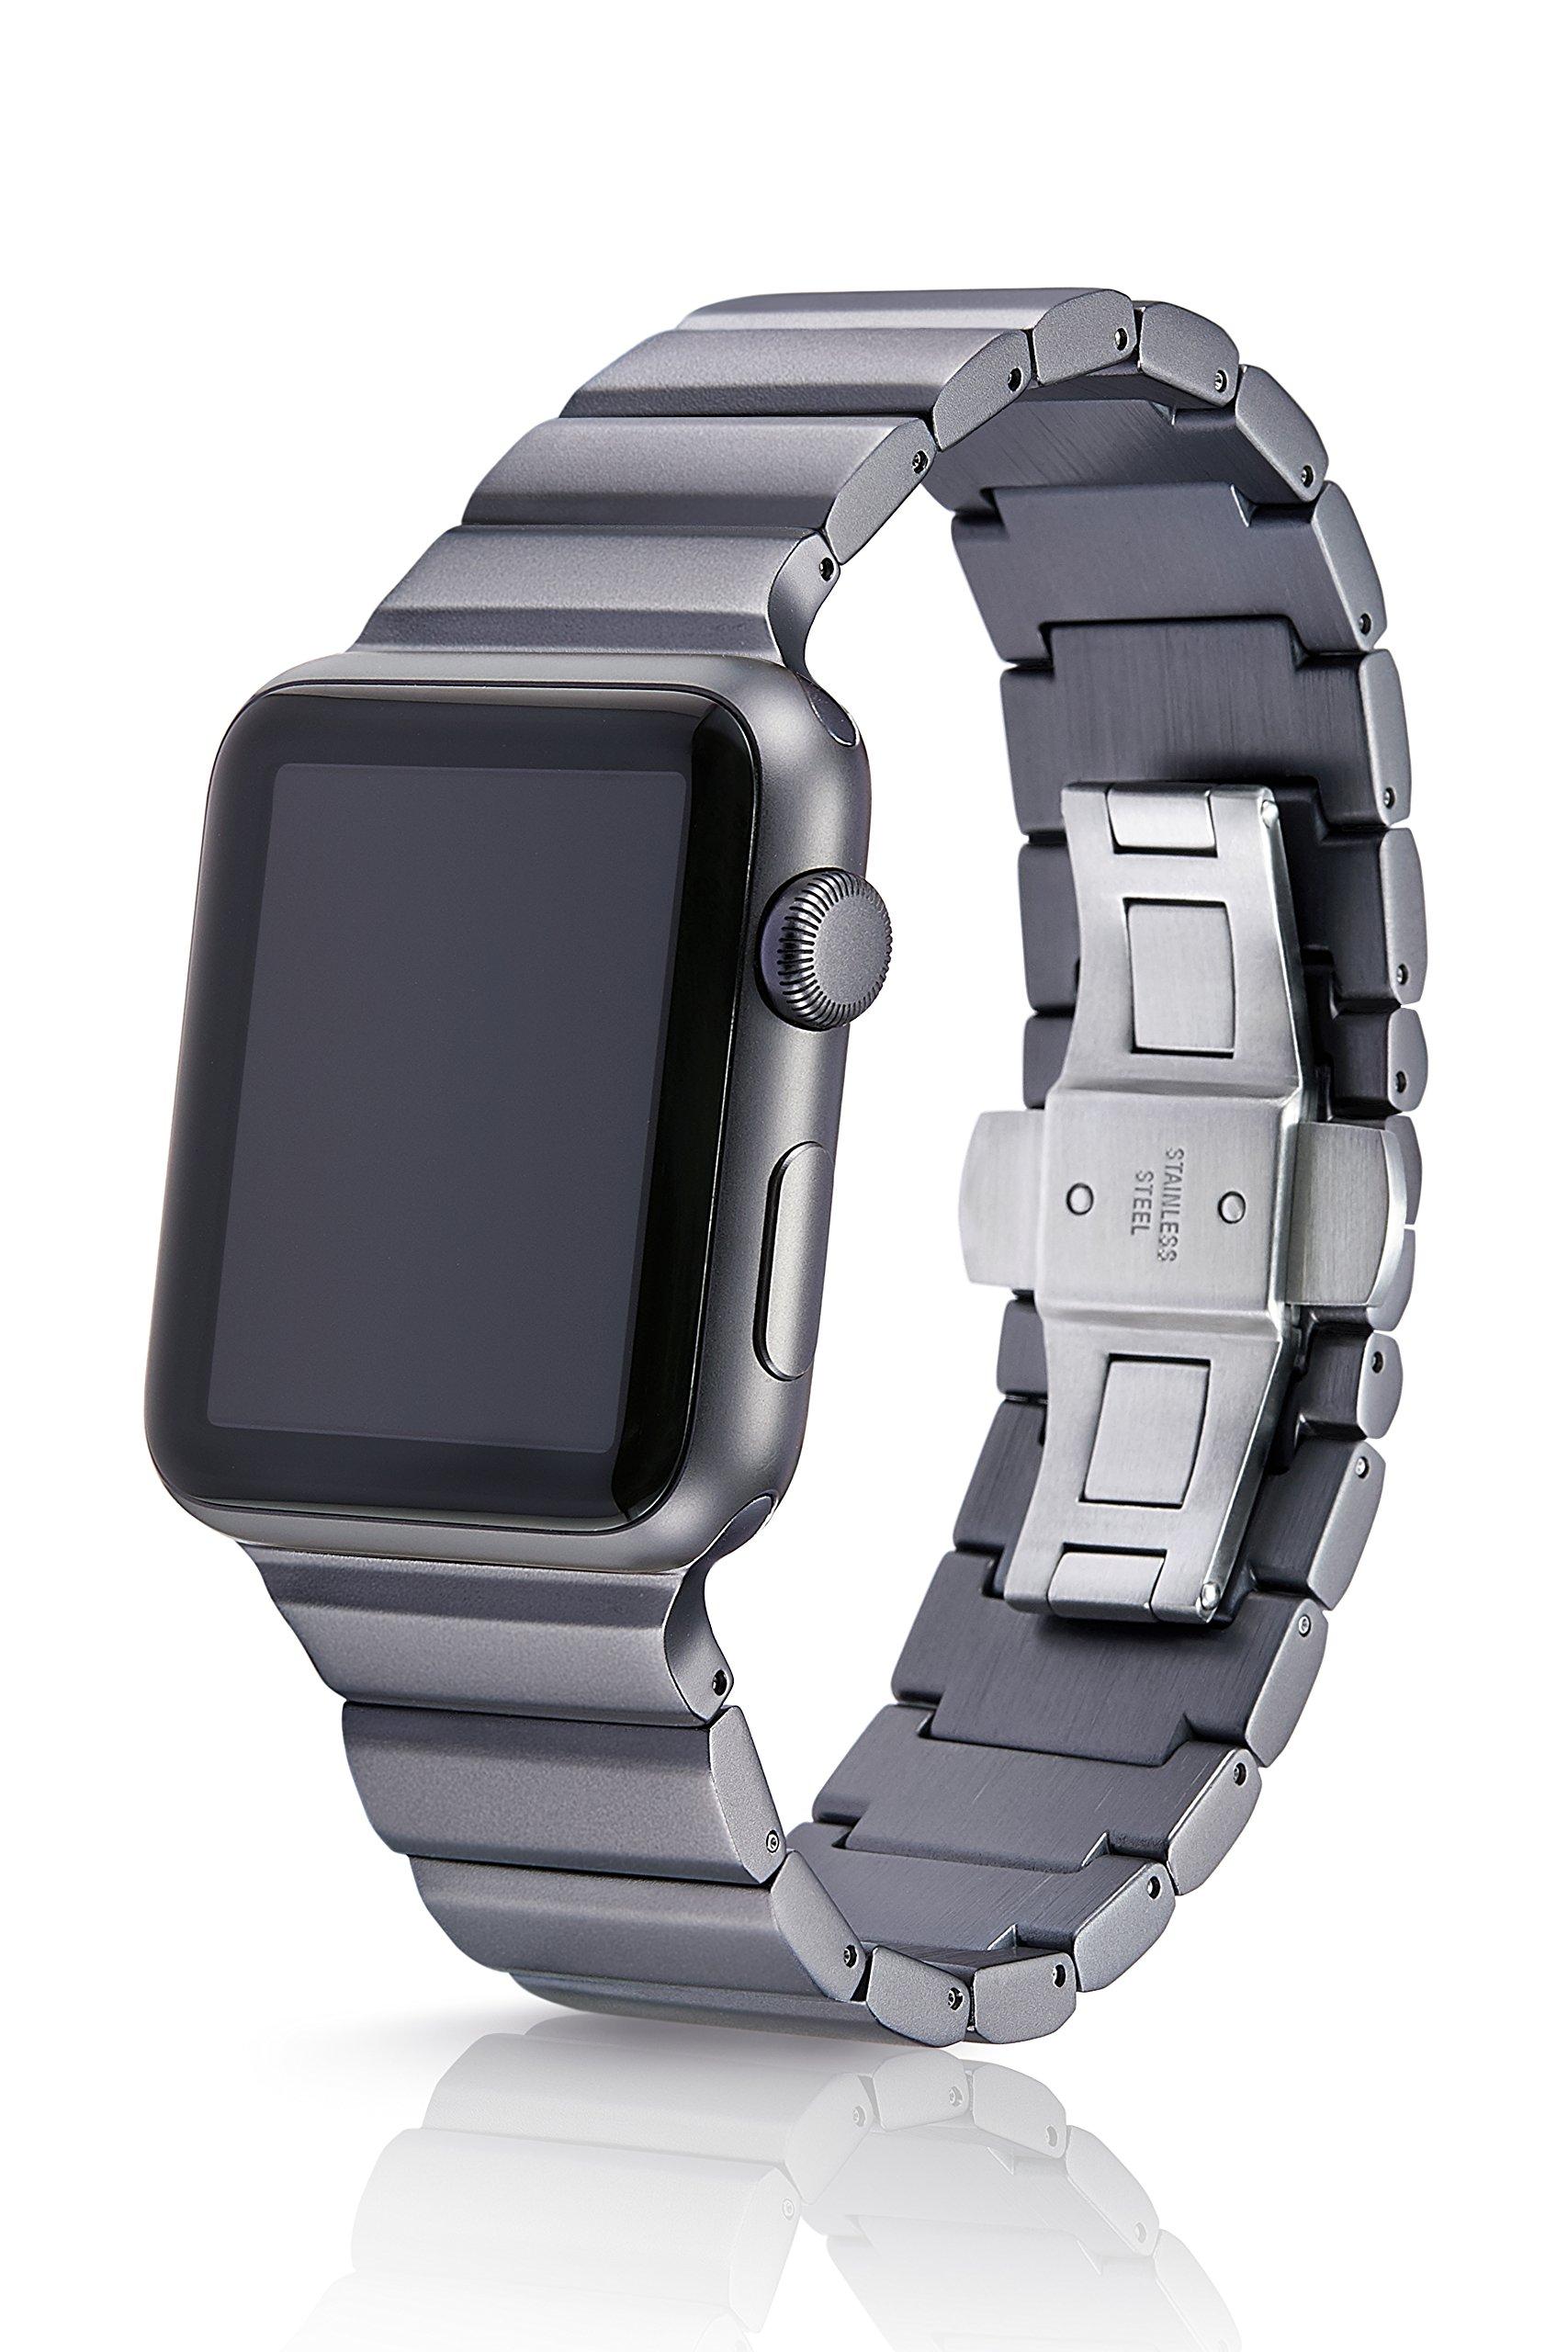 fbbdfd304ae 42 44mm JUUK Cosmic Grey Ligero Premium Watch Band Made for The Apple Watch